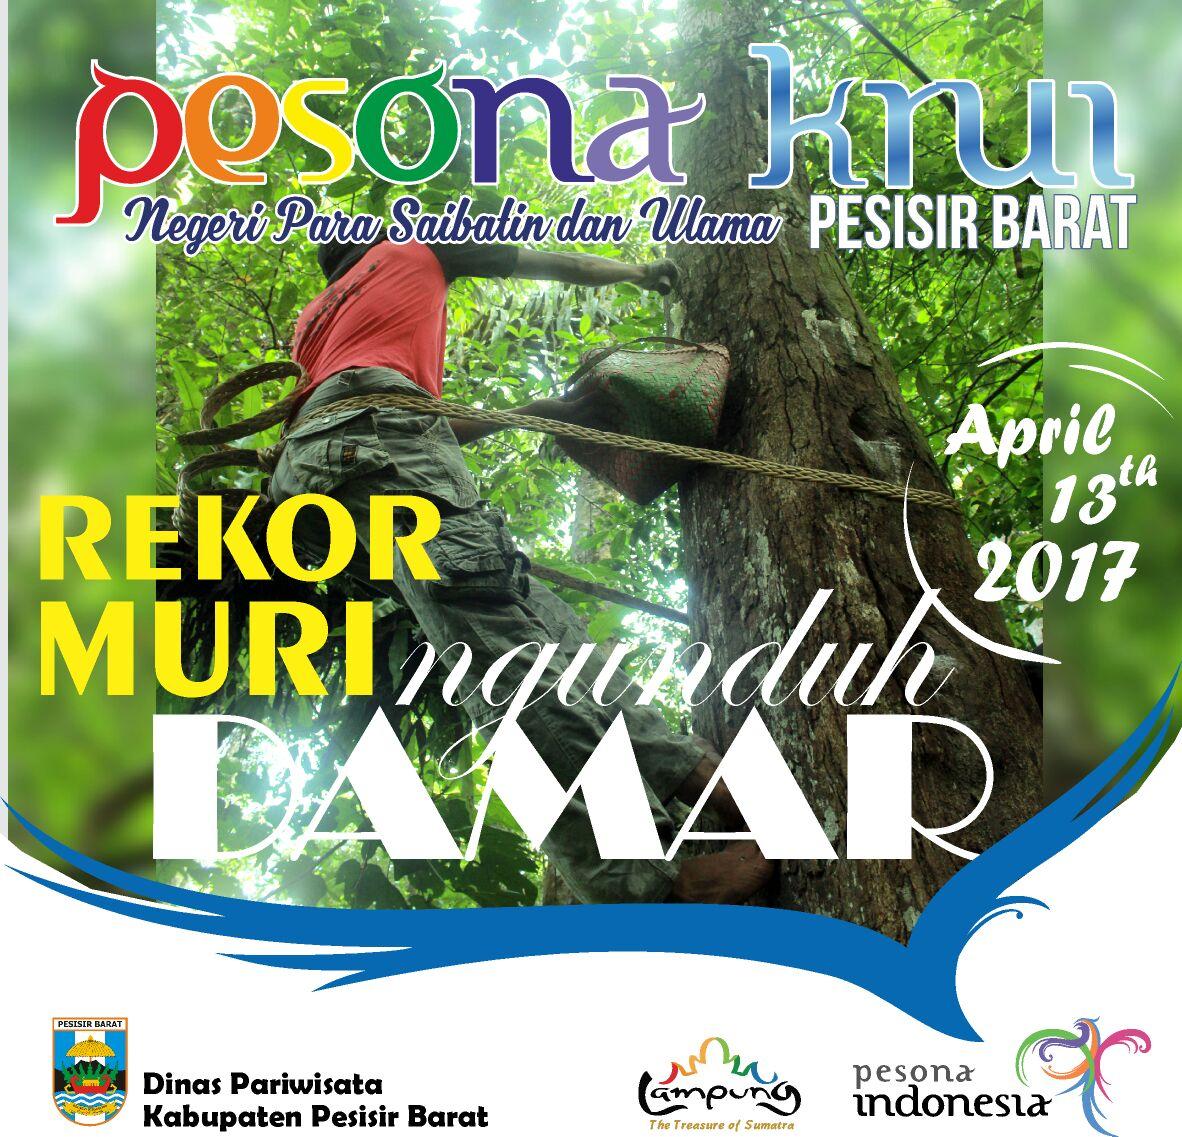 Flyer-Festival-Krui-2017-Ngunduh-Damar.jpg